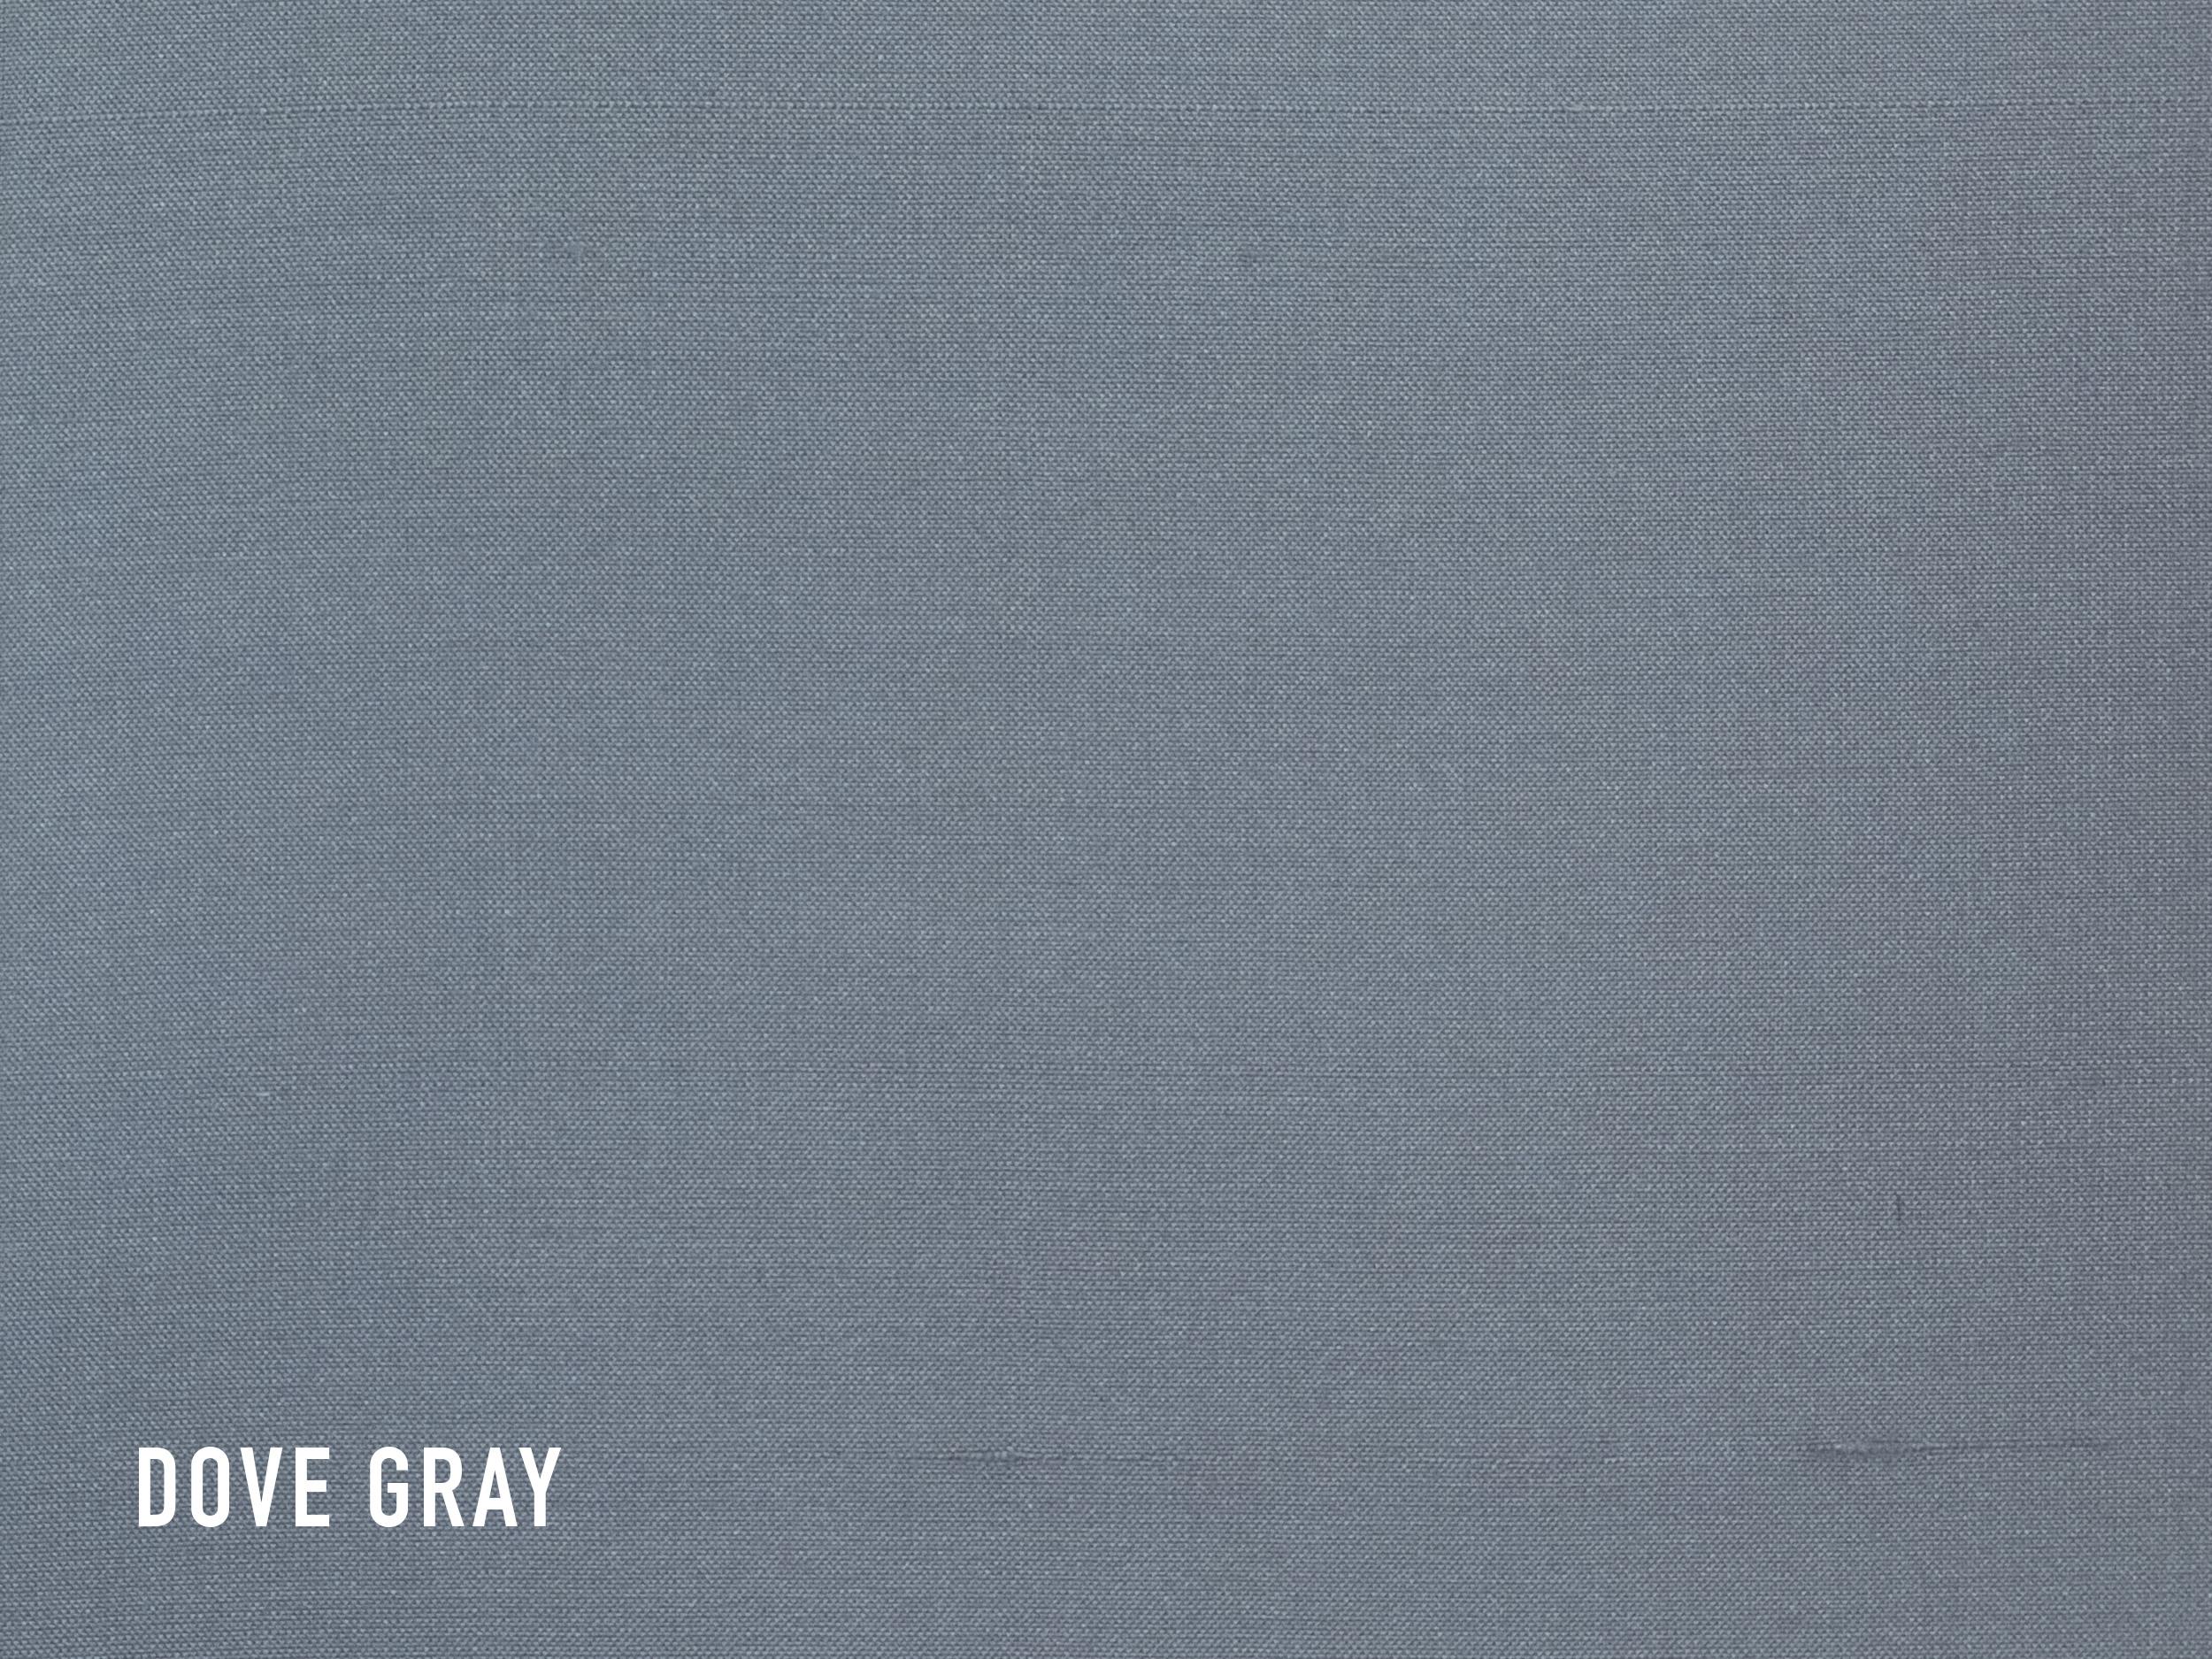 dove_gray.jpg